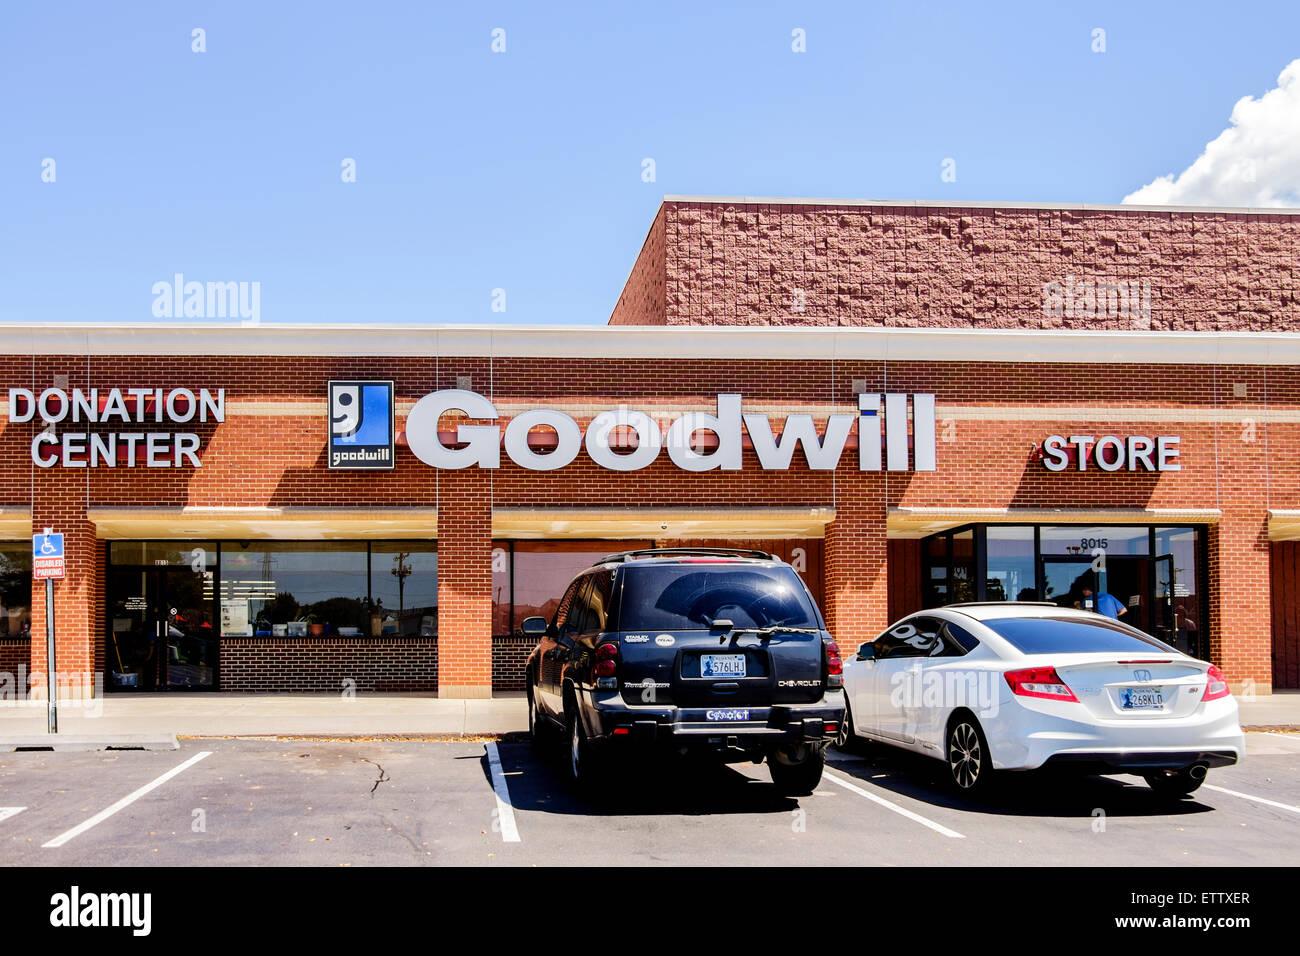 The exterior of a Goodwill Donaltion Center in Oklahoma City, Oklahoma, USA. - Stock Image